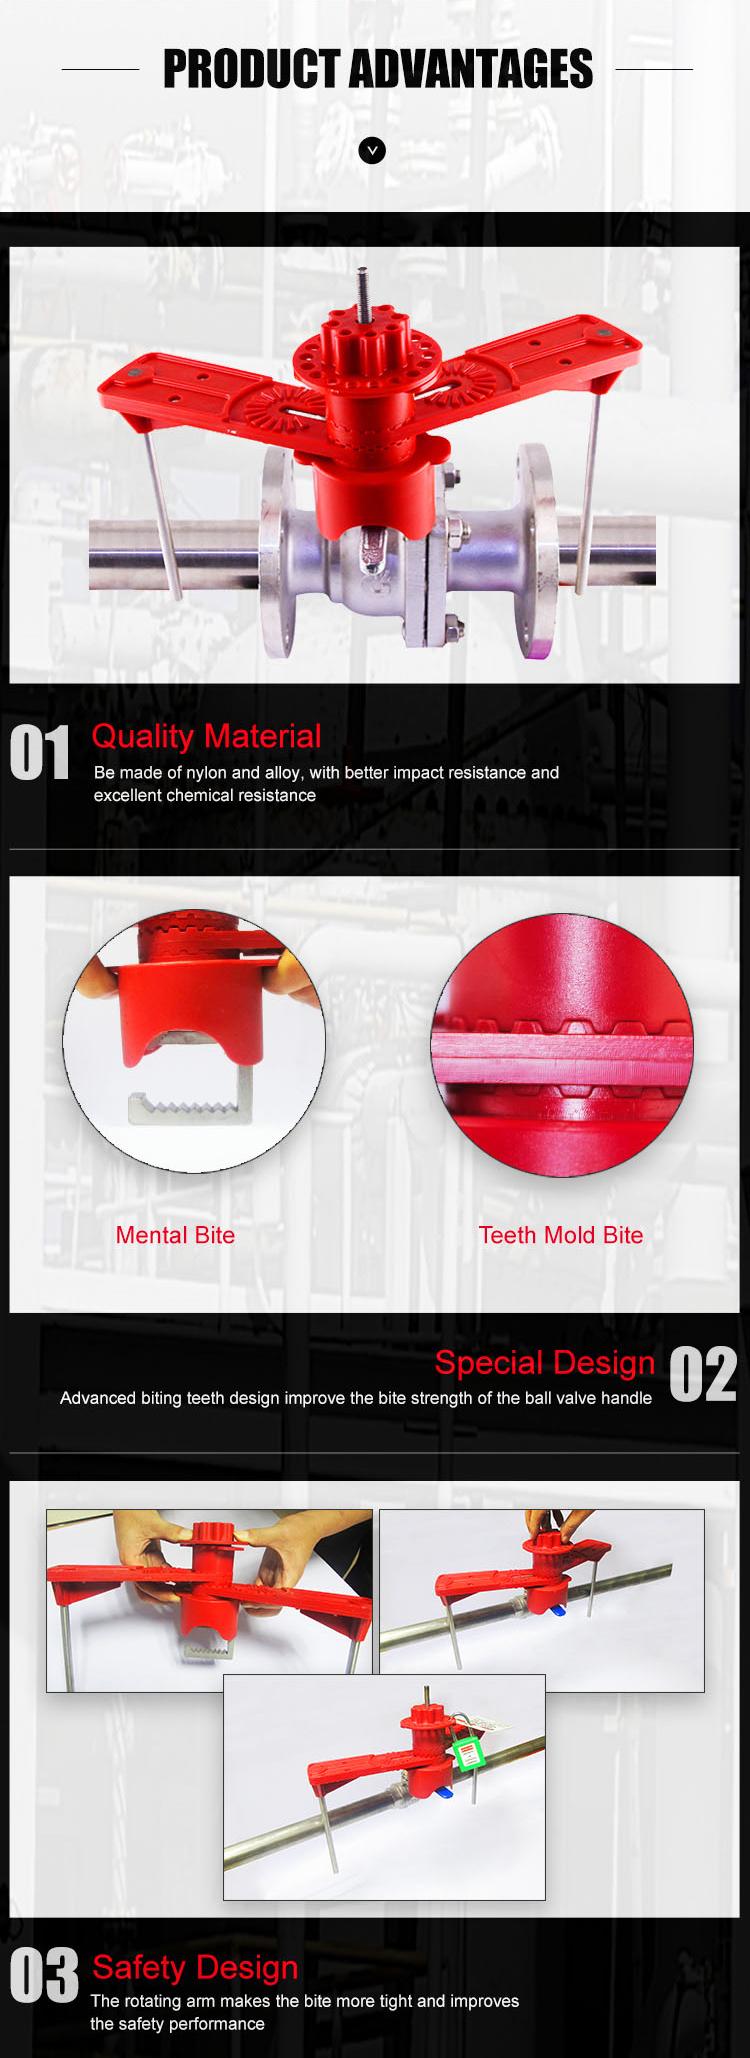 Double braccia Ball Universal Valve risk BD-8213